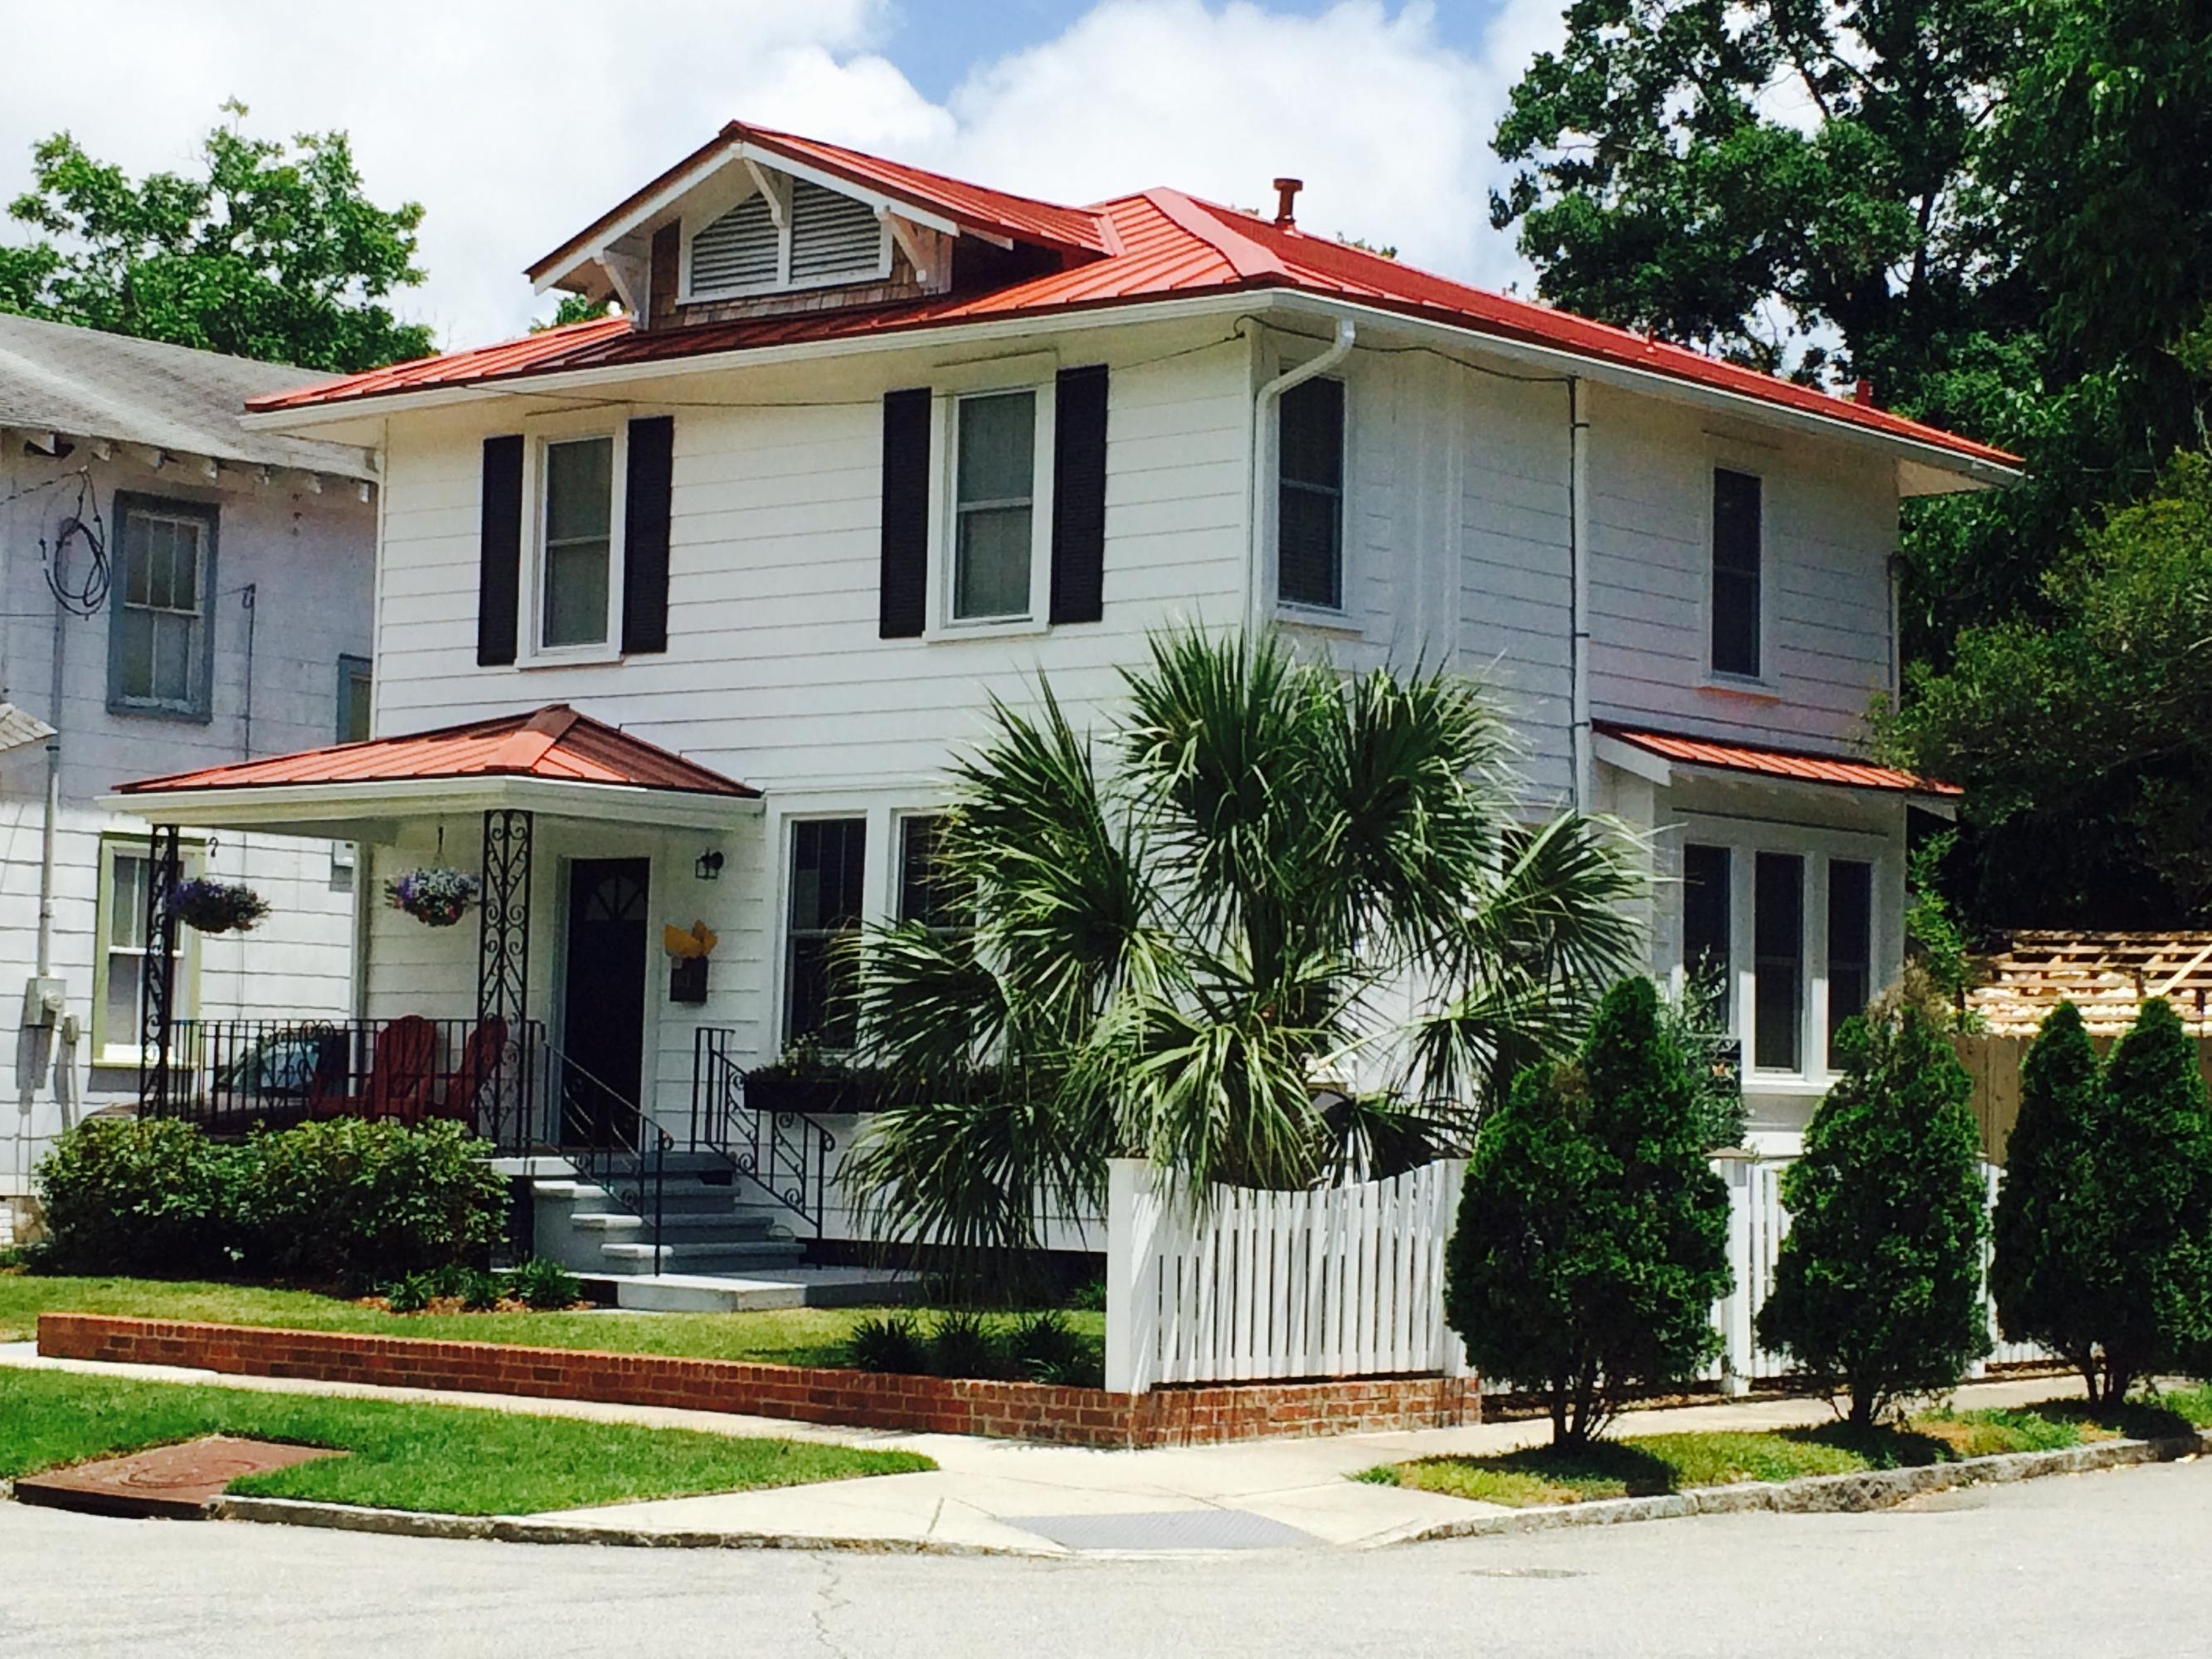 Photo of 63 Maple St, Charleston, SC 29403